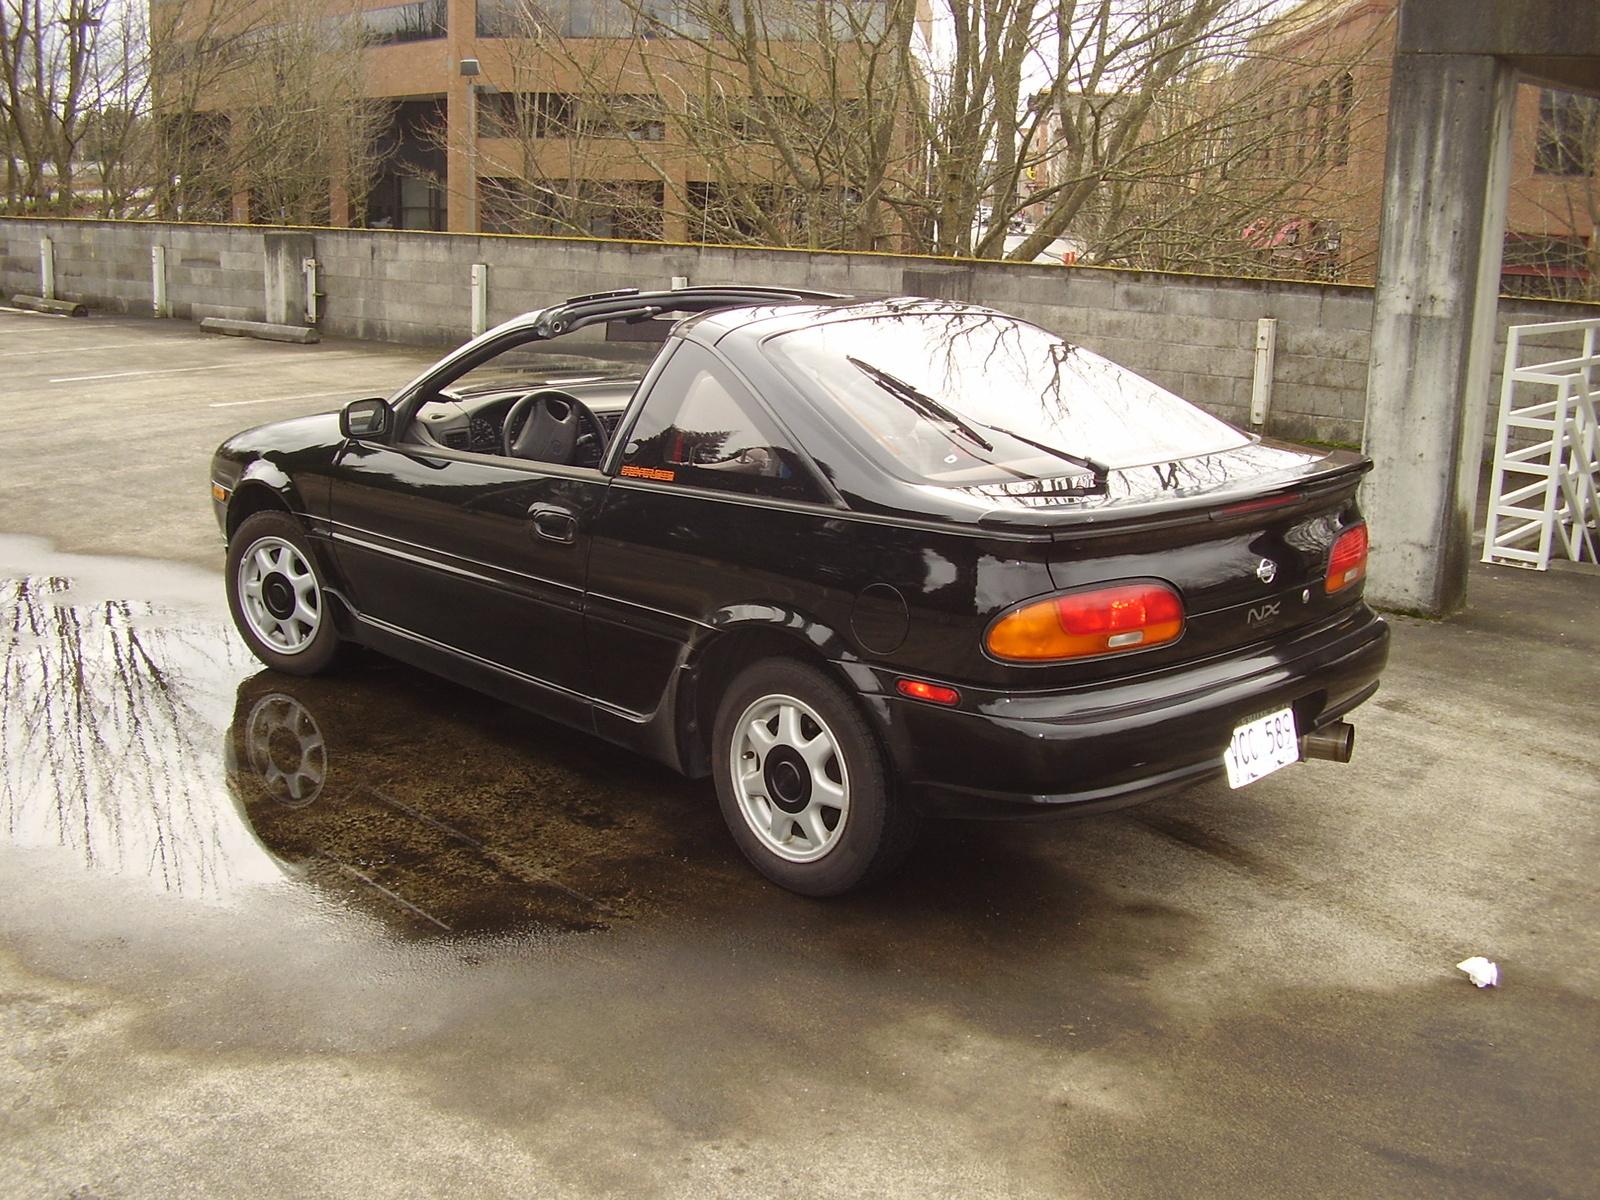 1993 Nissan Nx2000 1993 Nissan nx 6 Nissan nx 6